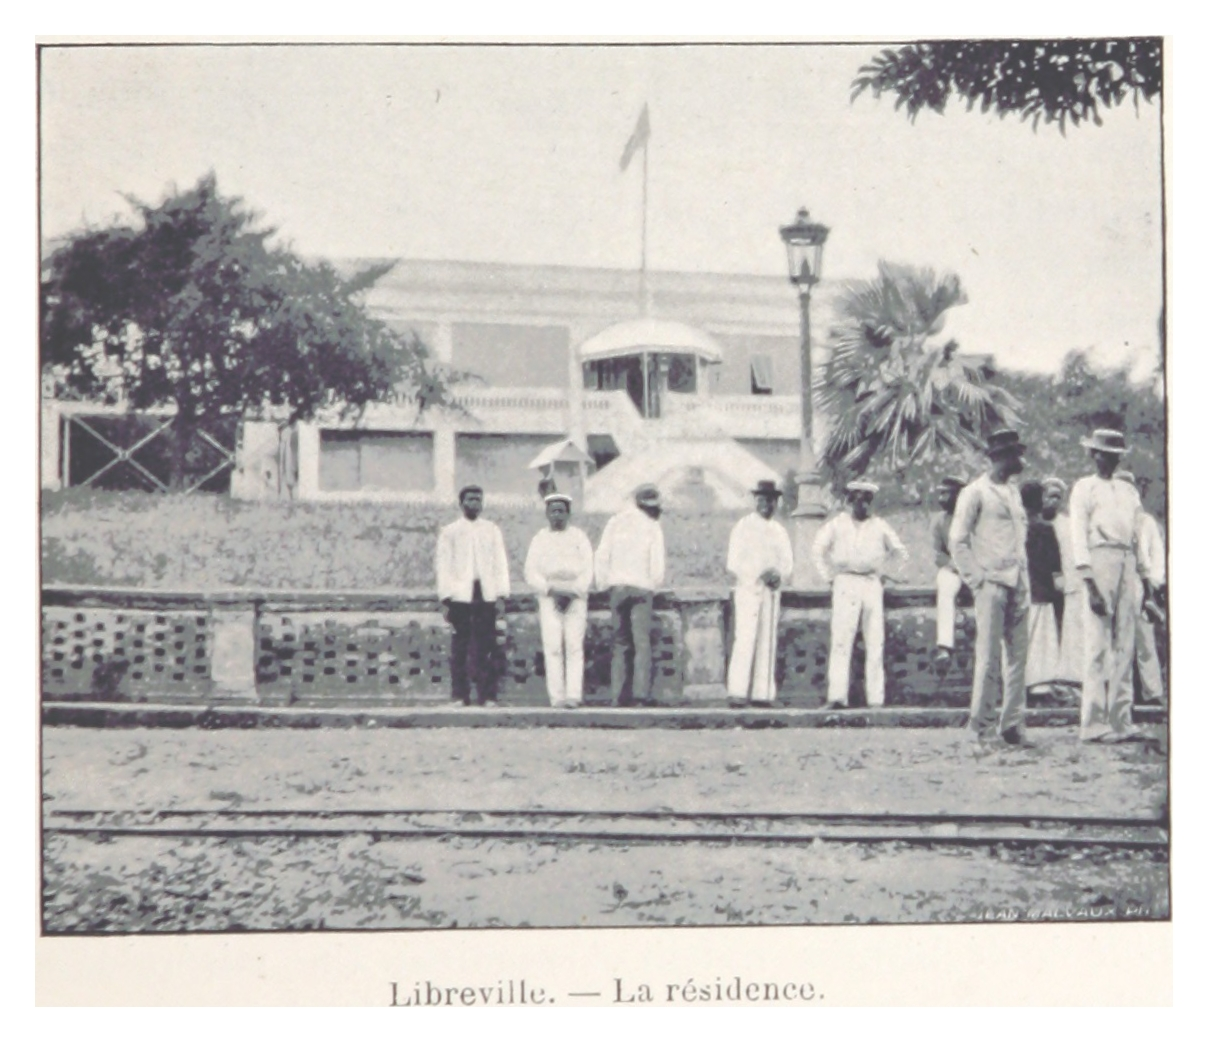 Wiki: Libreville